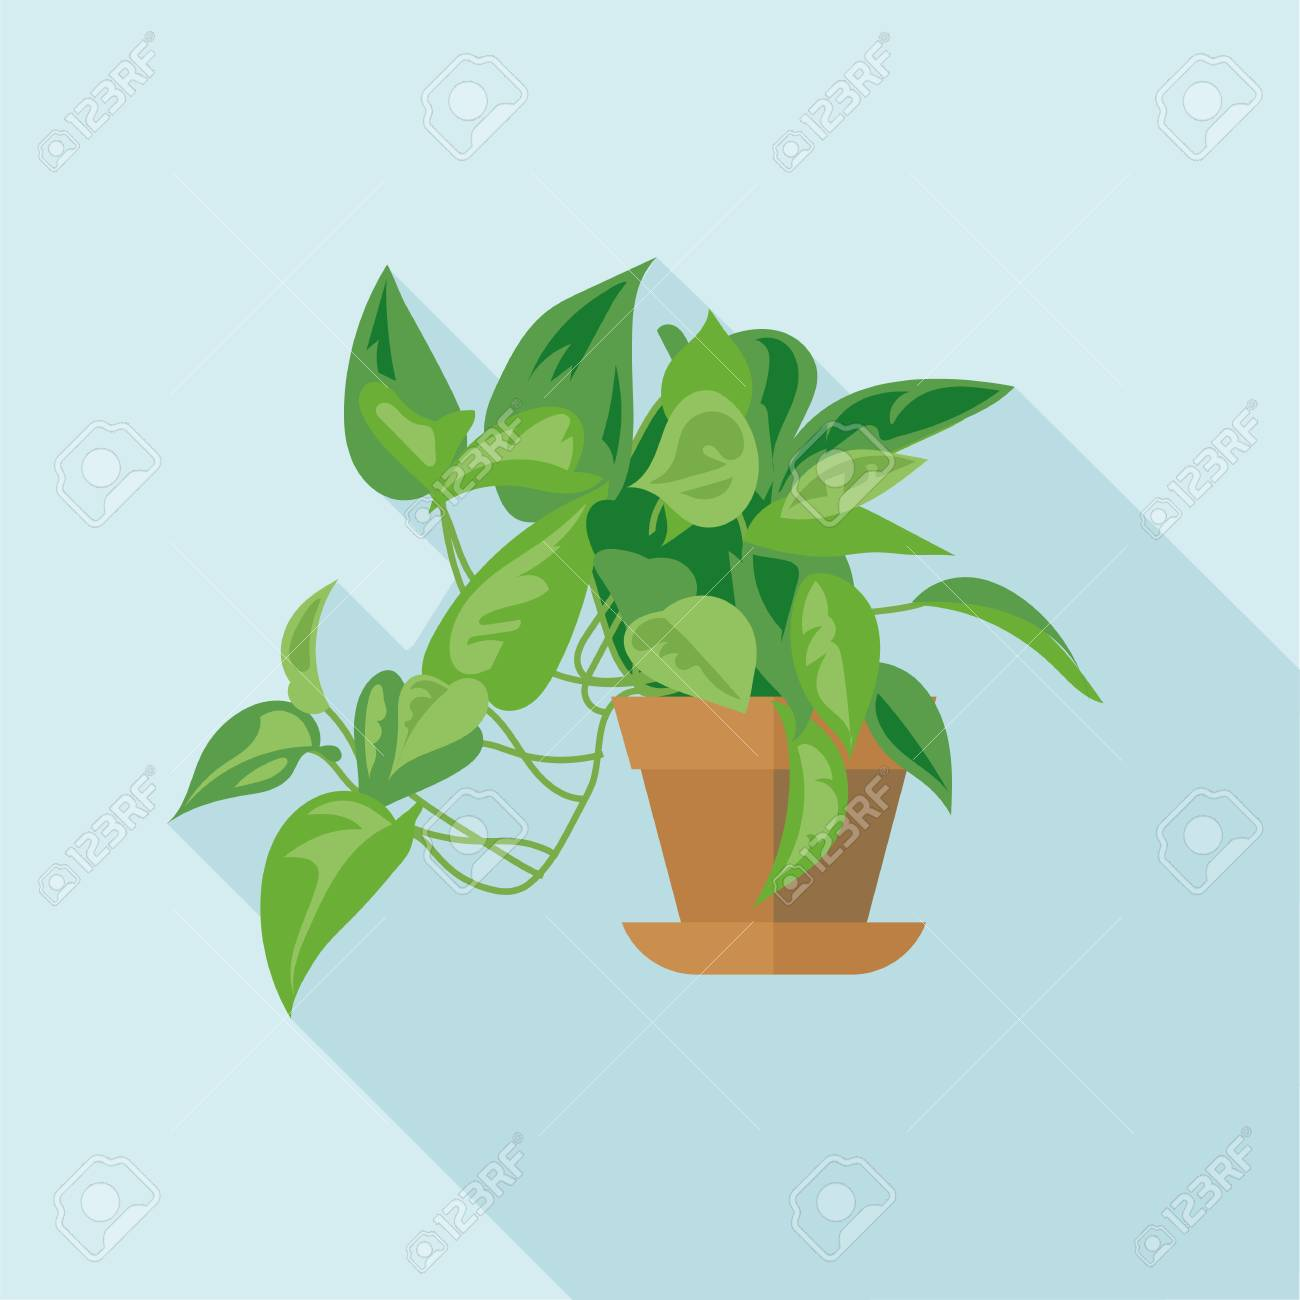 Digitale Vektor Grune Dekorative Buro Pflanze Mit Topf Braun Flat